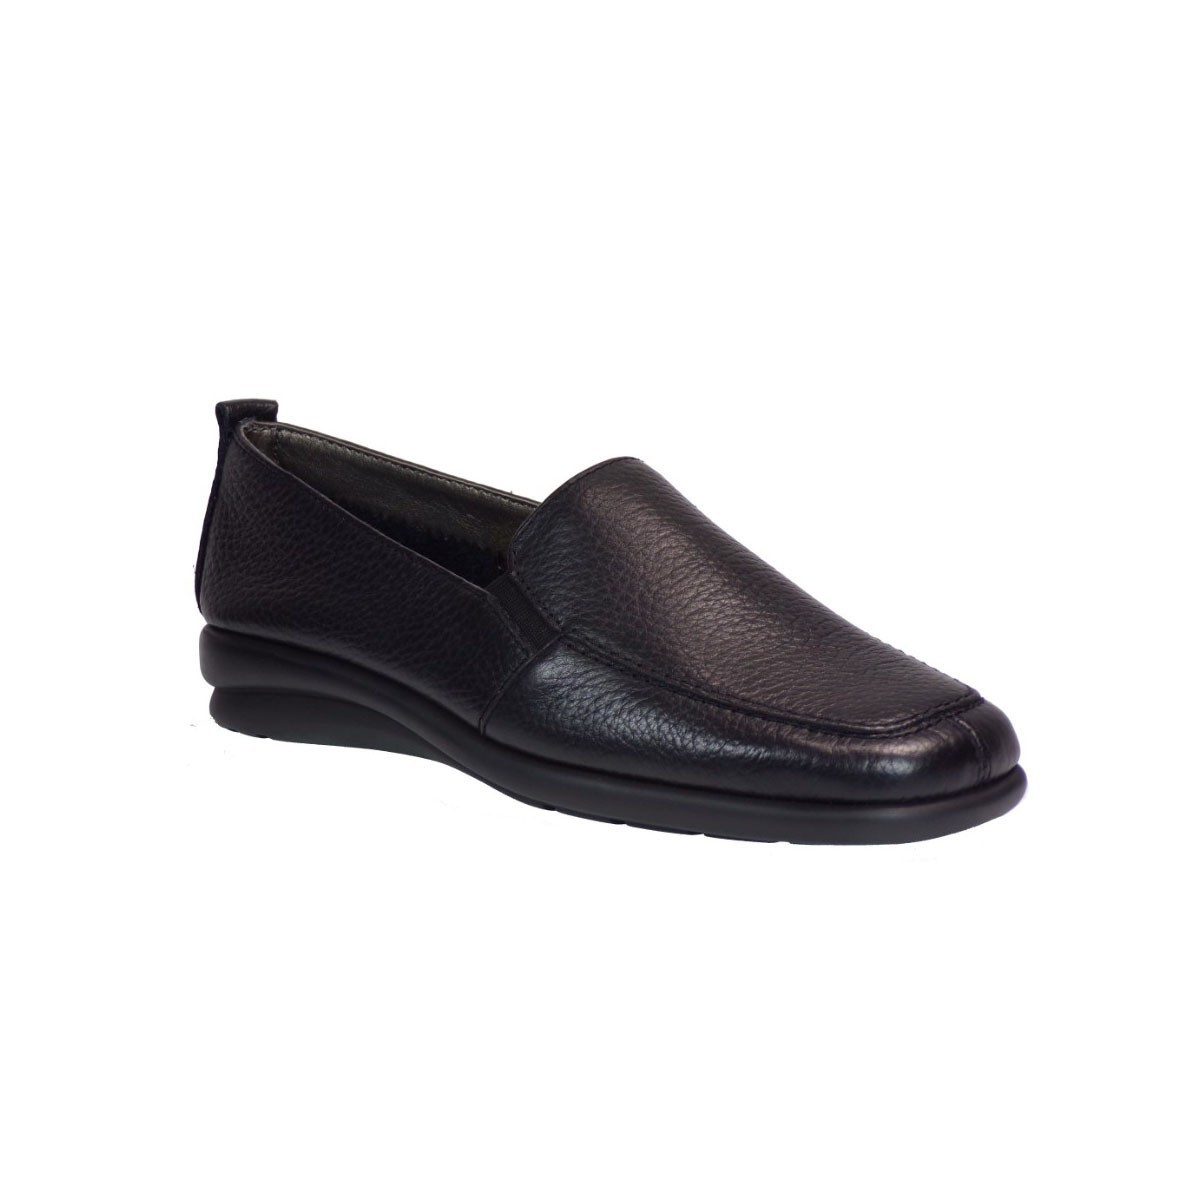 Verosoft Γυναικεία Παπούτσια Backstreet Veroso Μαύρο Verosoft Backstreet veroso M